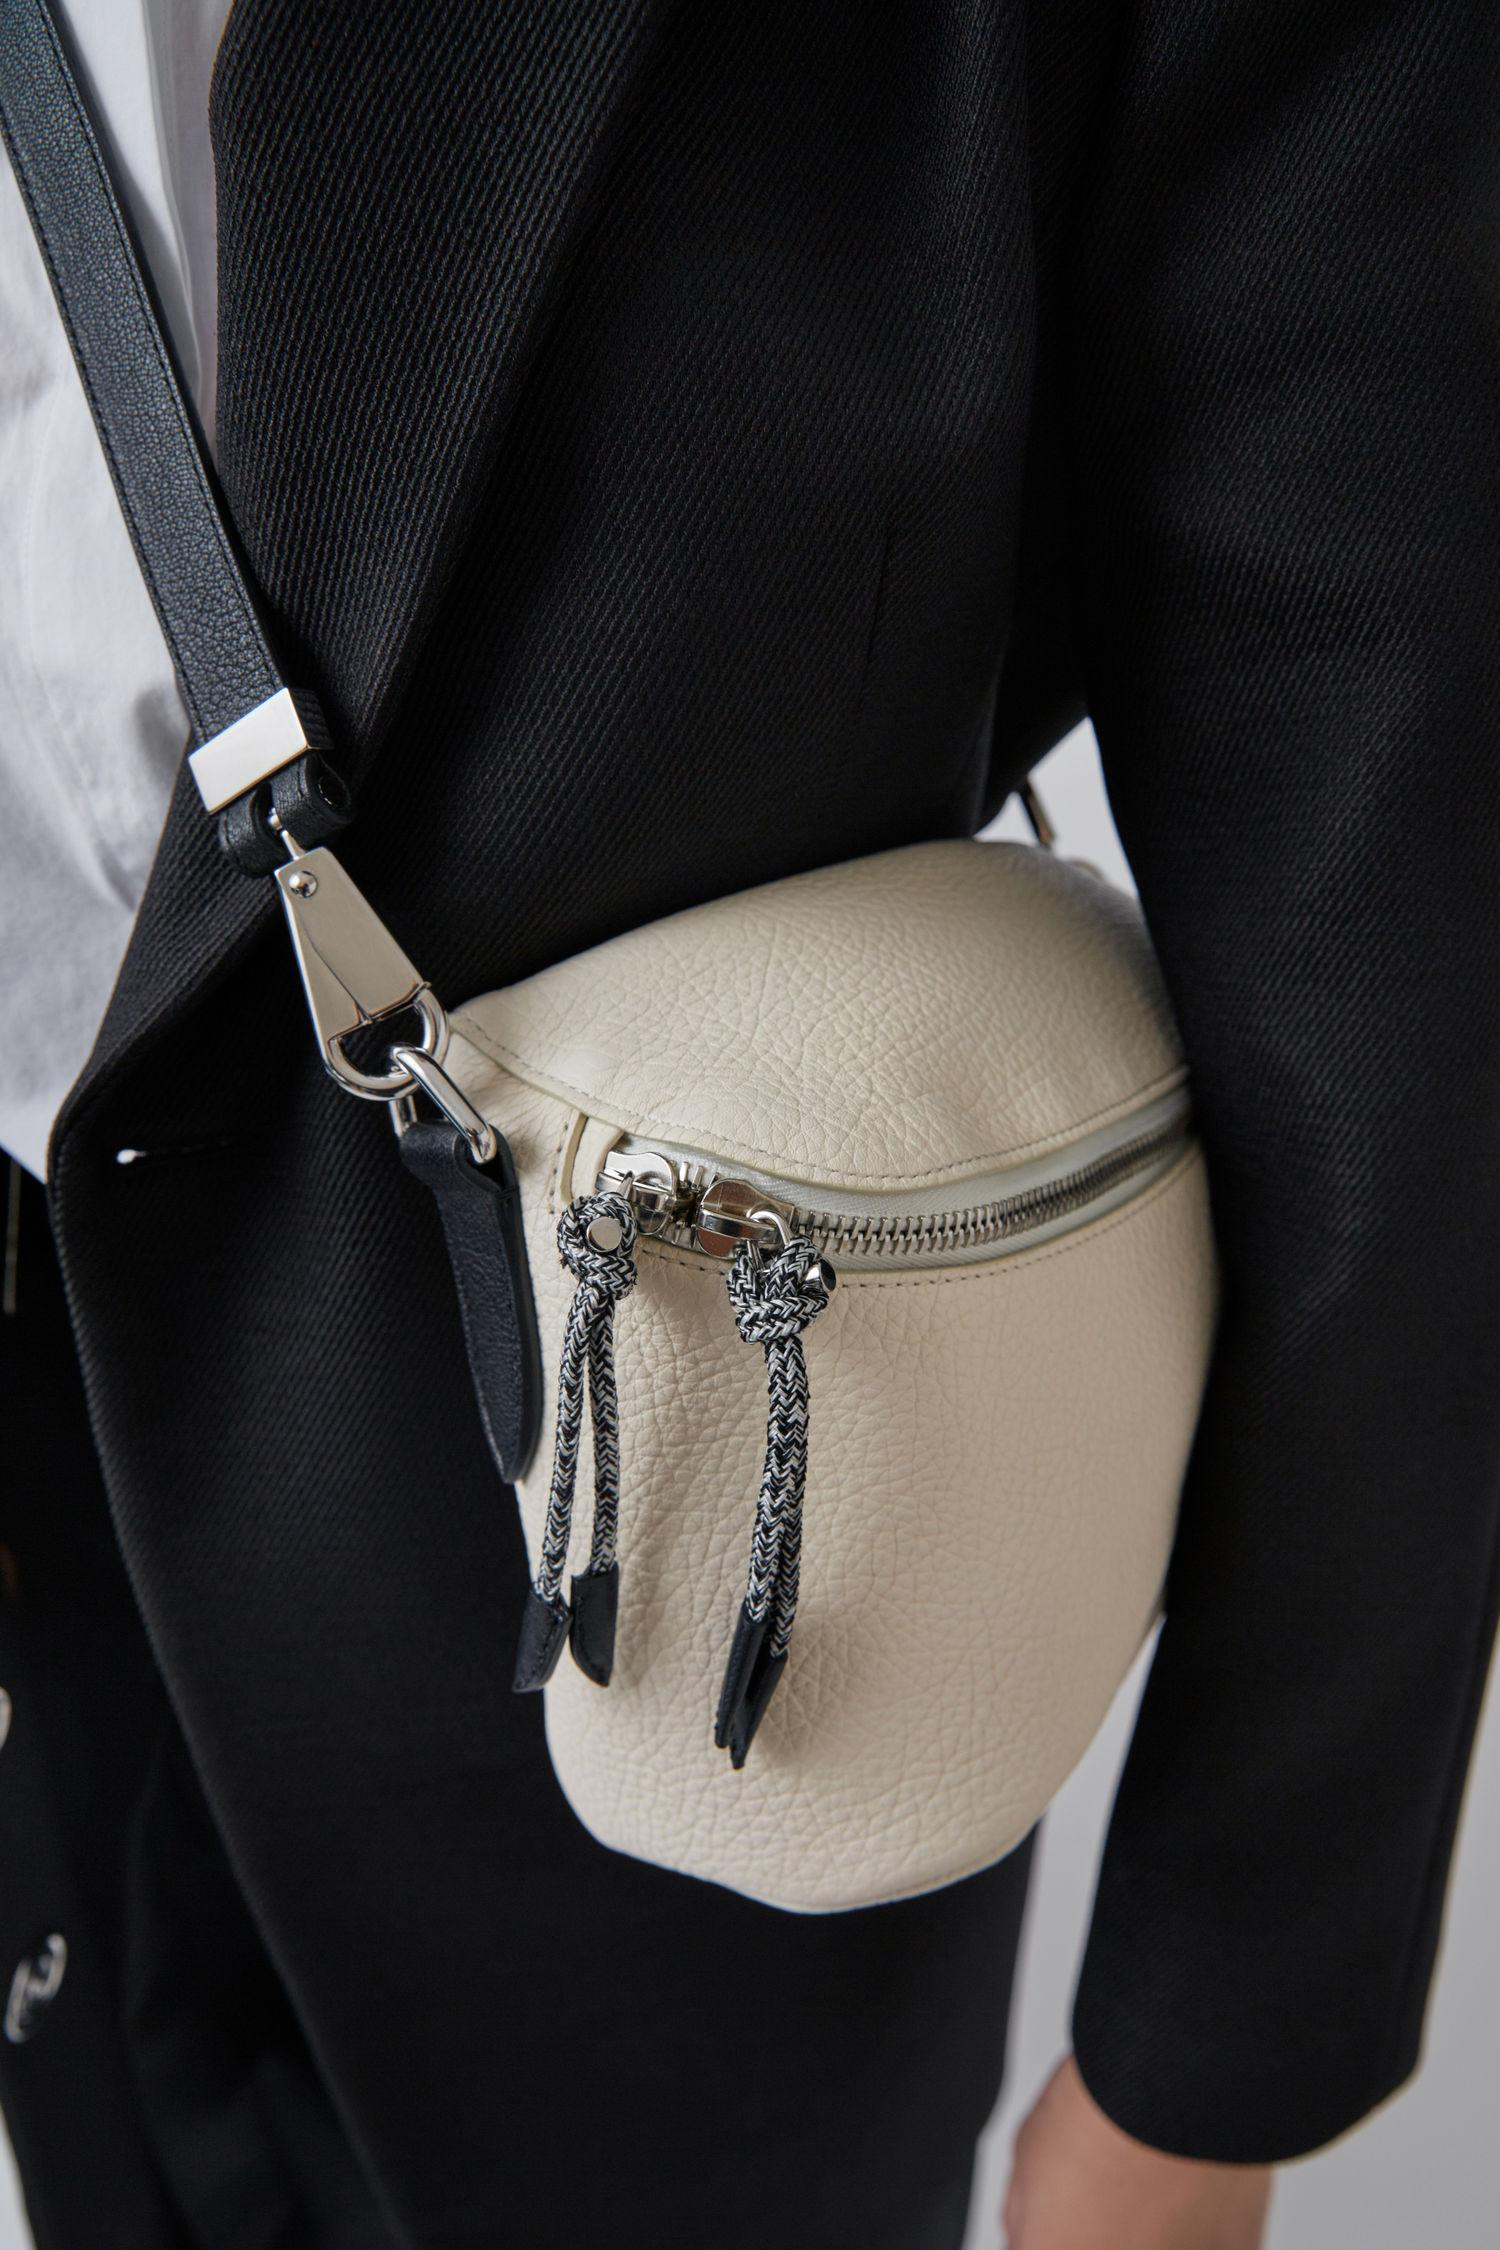 acne rope messenger bag